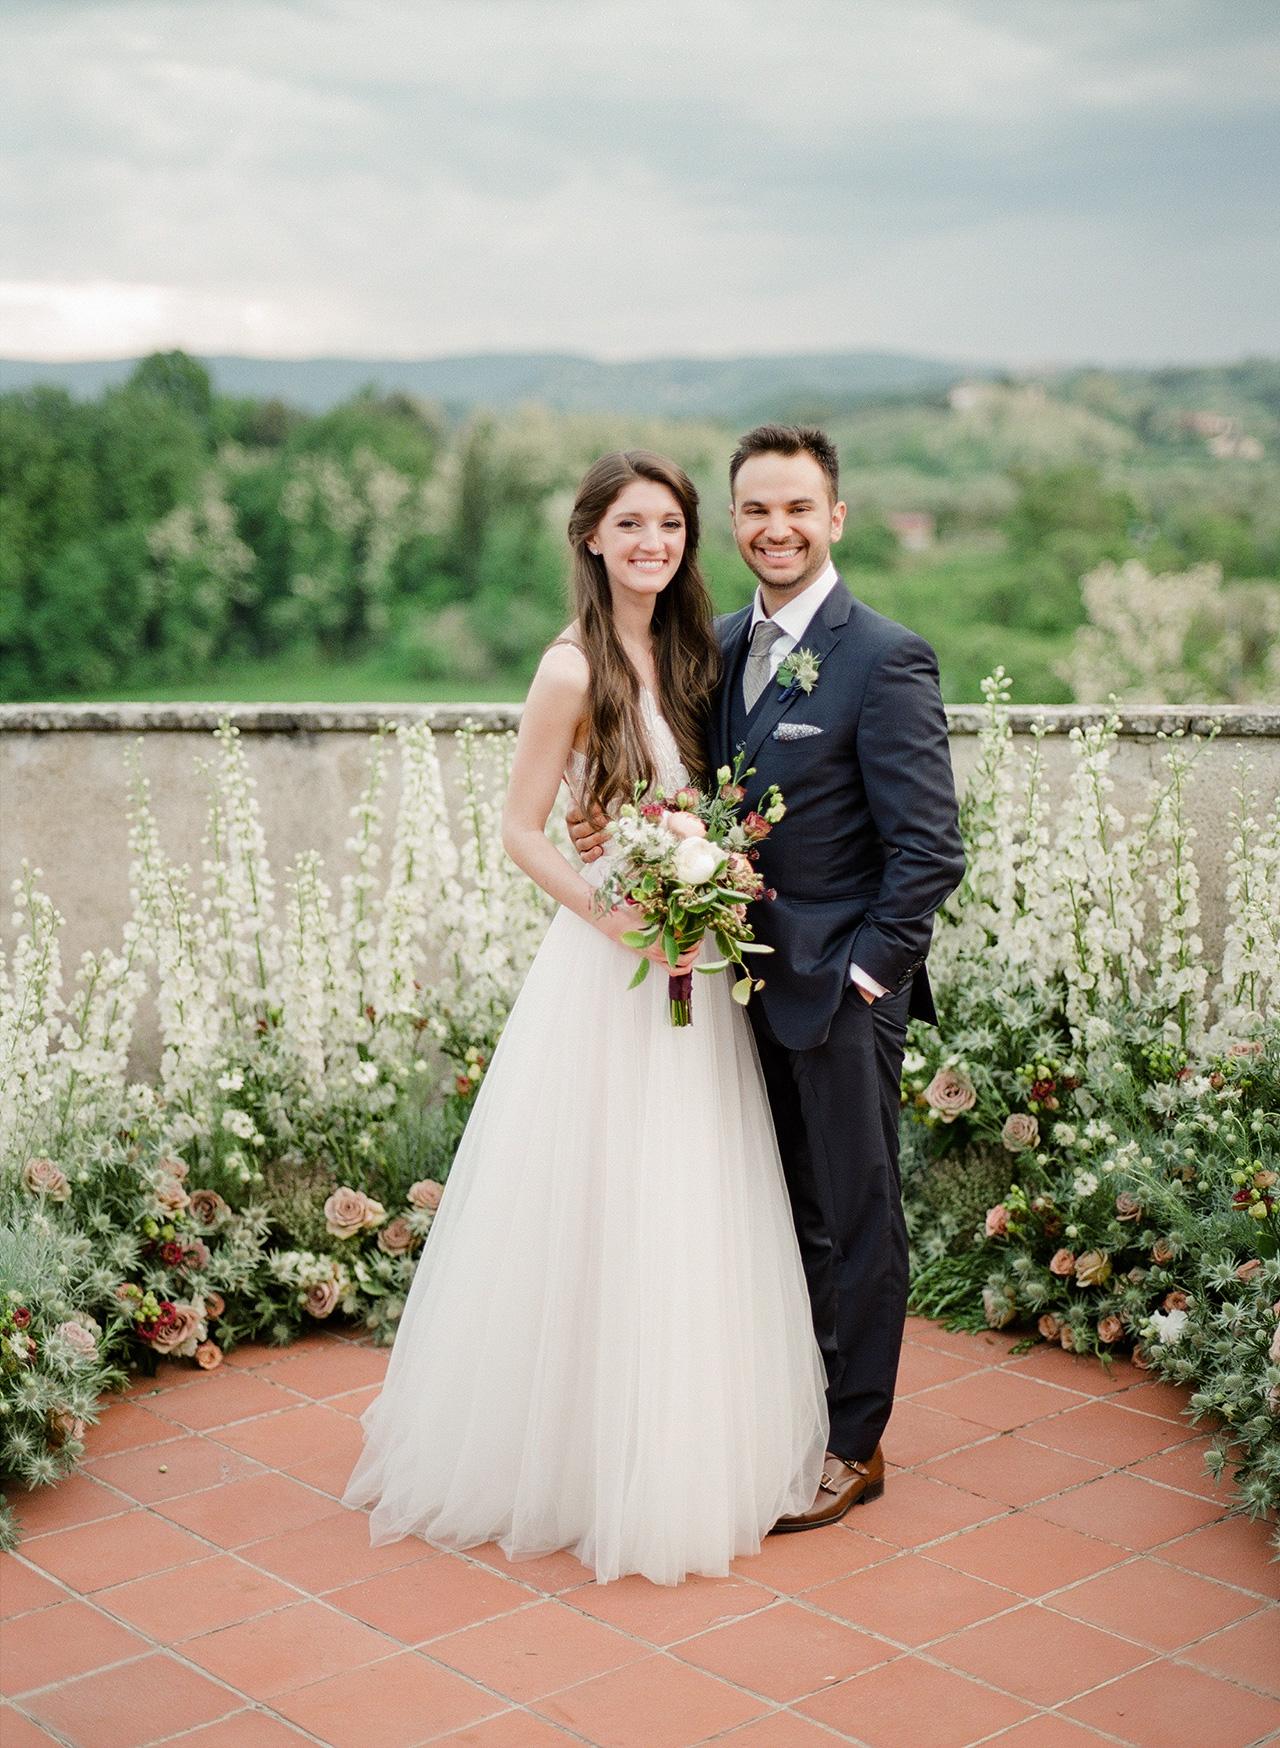 bride groom wedding pose country side backdrop